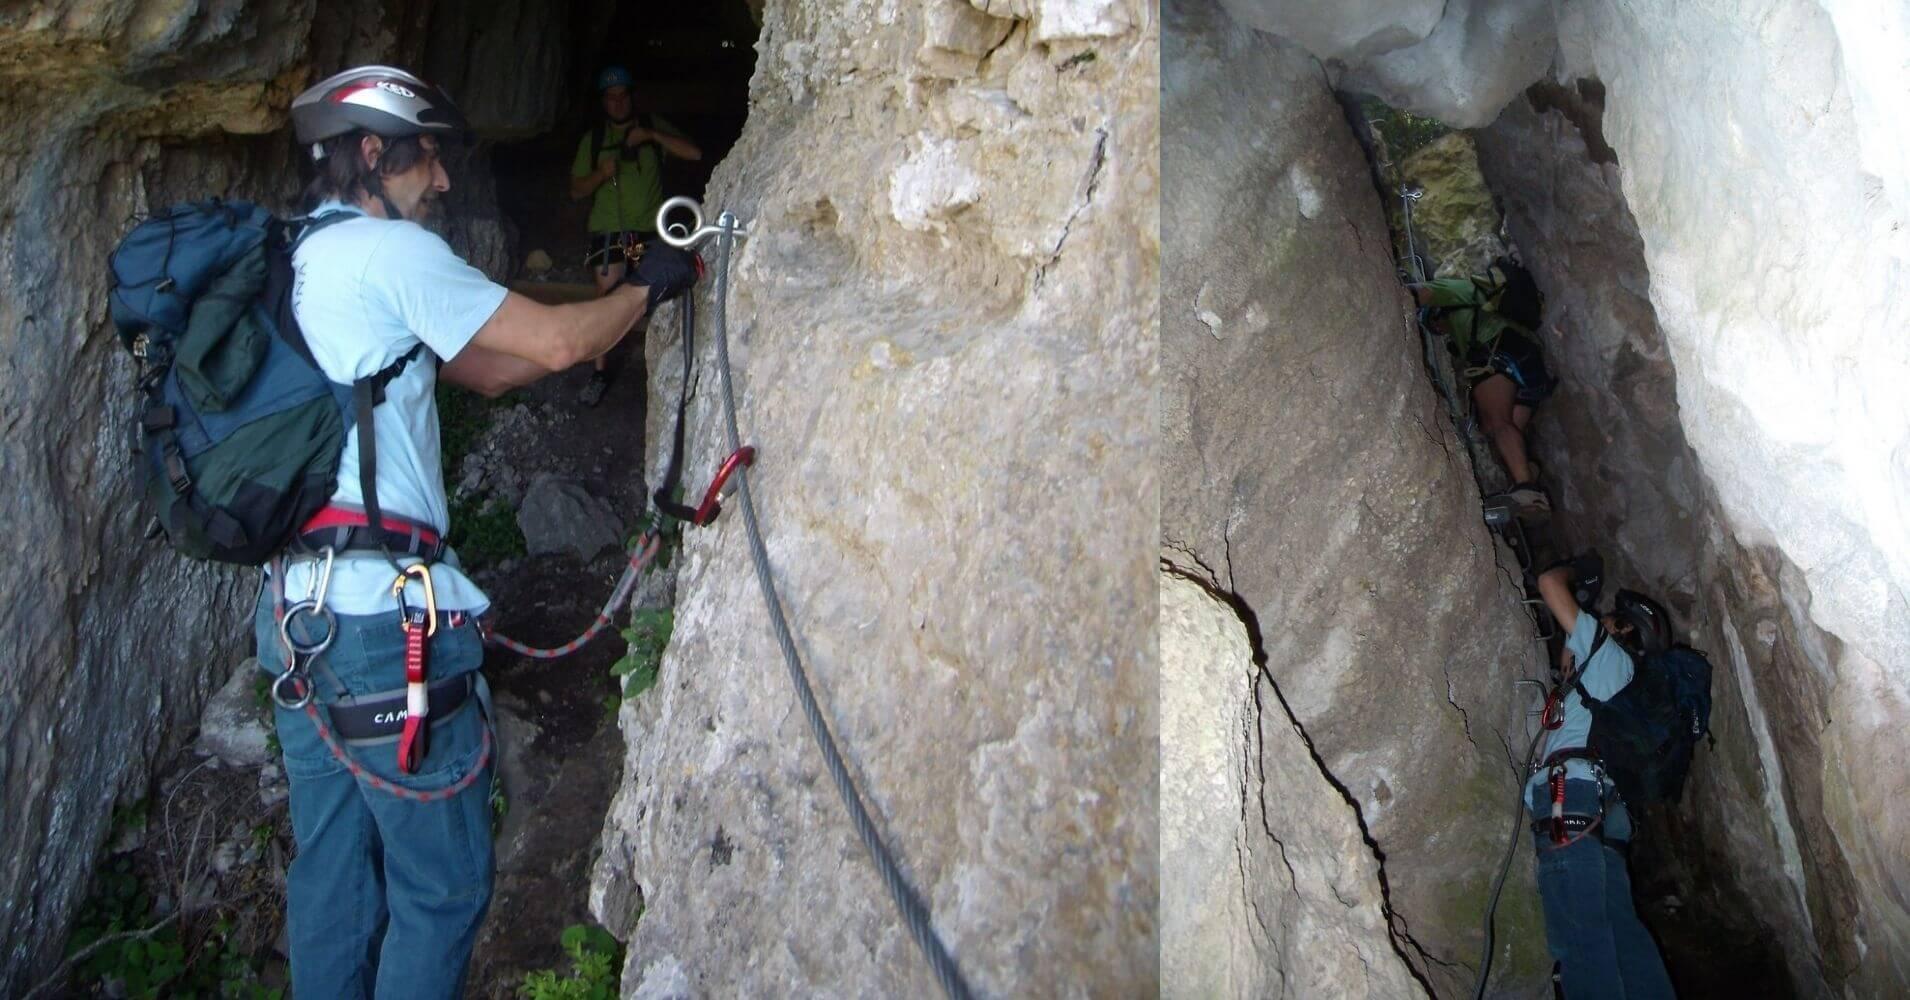 Inicio de la Cueva Ferrata Liaucous. Aveyron, Occitania. Francia.